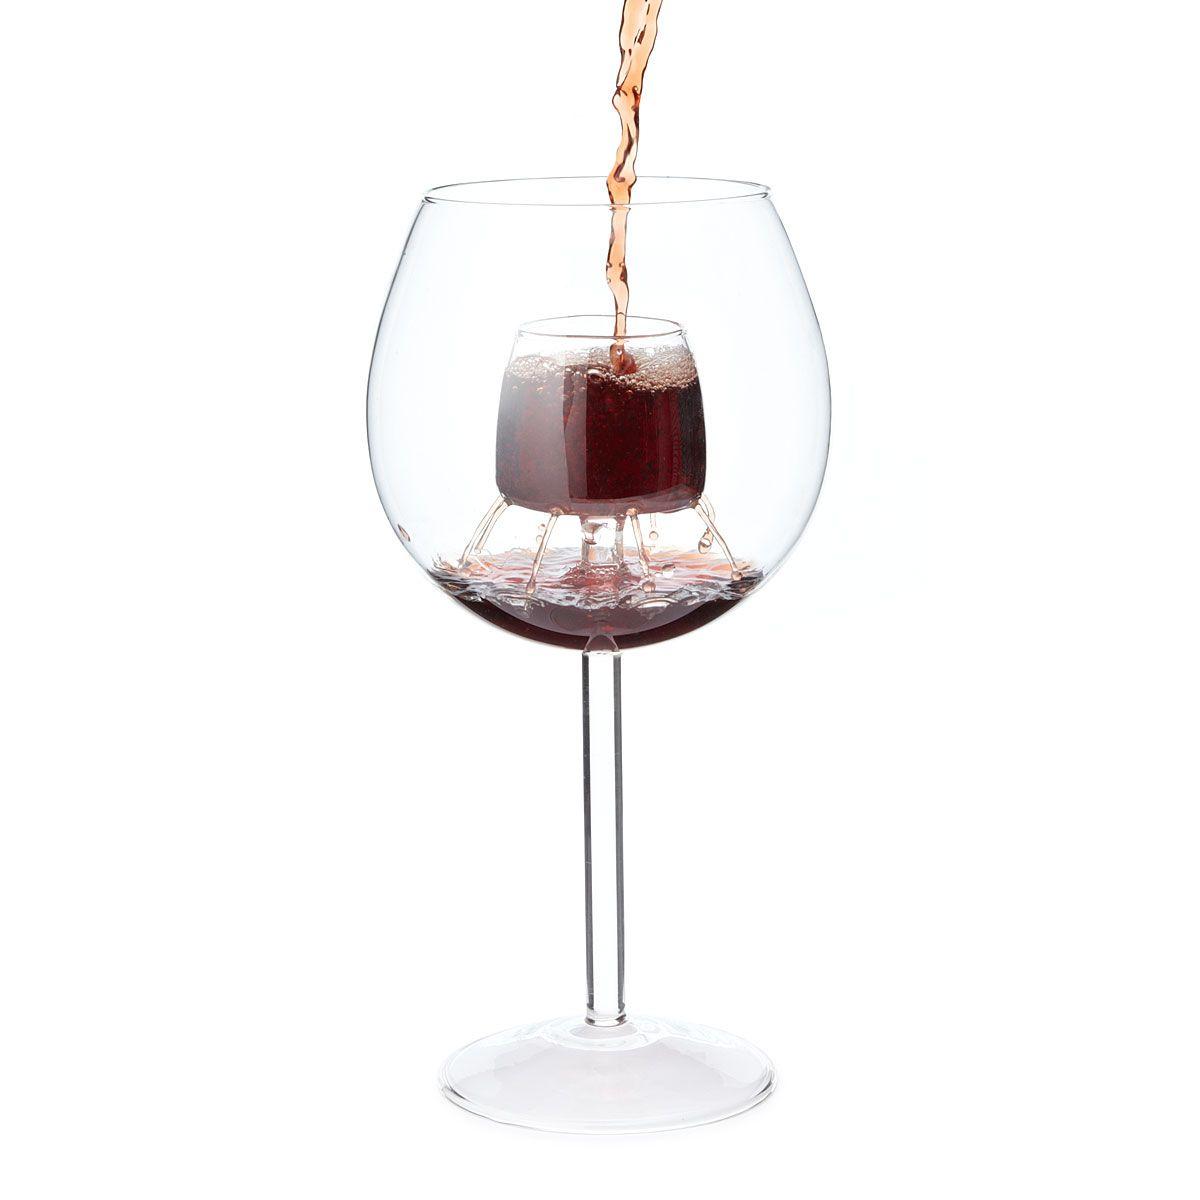 Fountain Aerating Wine Glasses Set Of 2 Self Aerating Wine Glass Decanter Aerating Wine Glasses Vintage Wine Wine Aerators